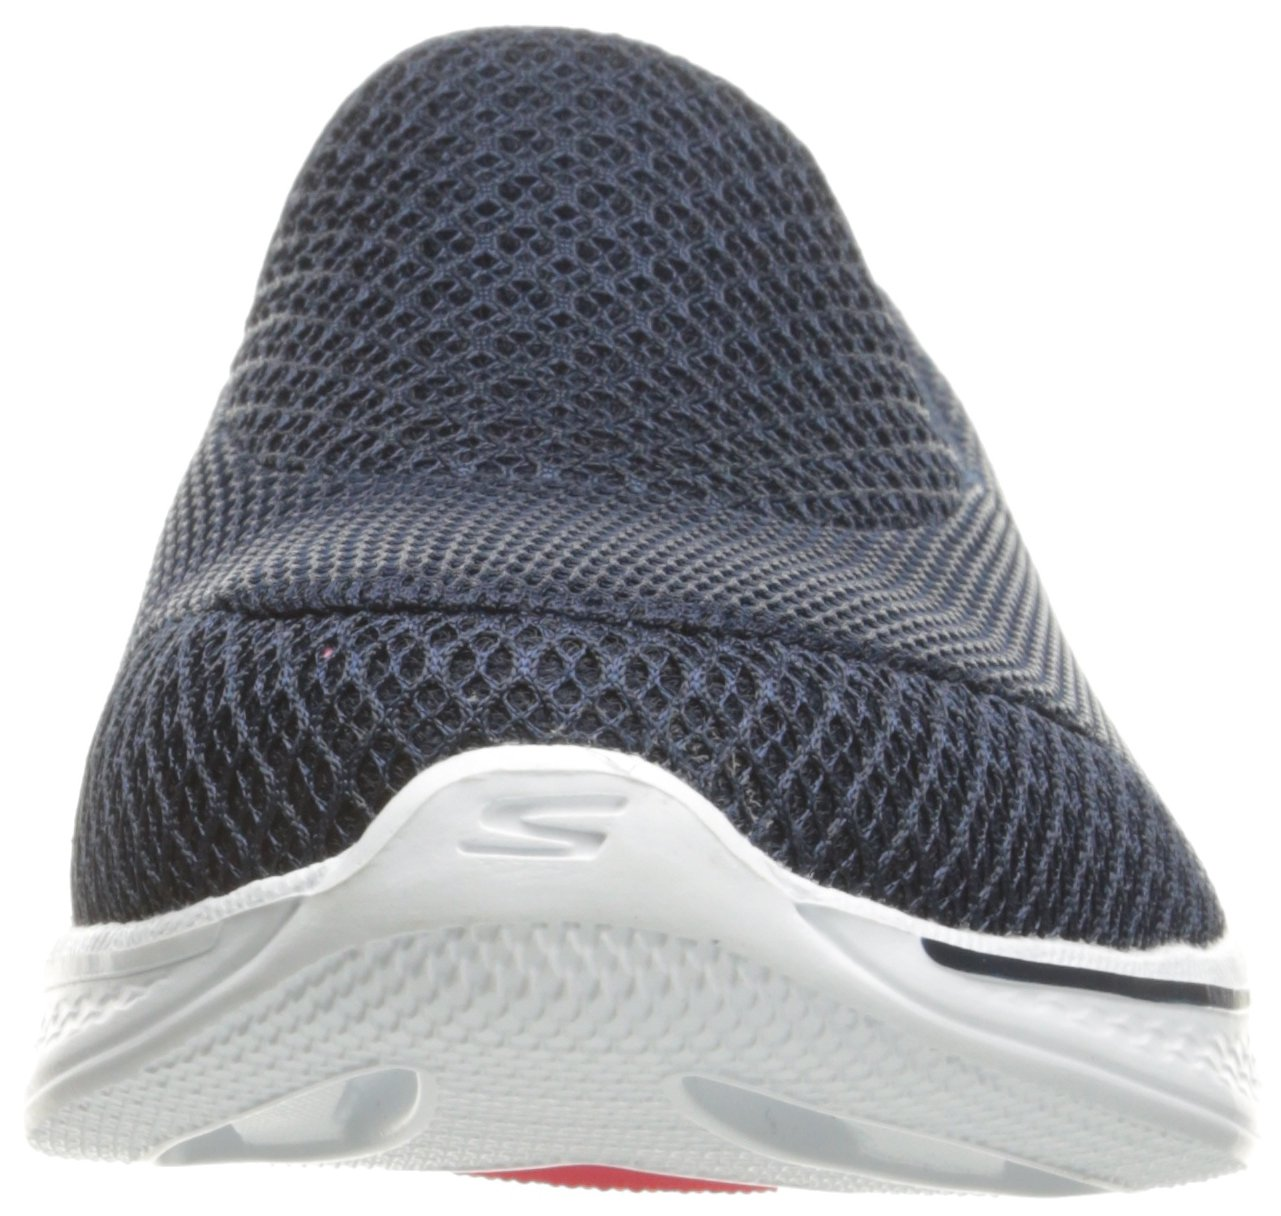 Skechers Performance Women's Go Shoe Walk 4 Propel Walking Shoe Go B01IIZIMTE 10 B(M) US|Navy/White f2e4fa